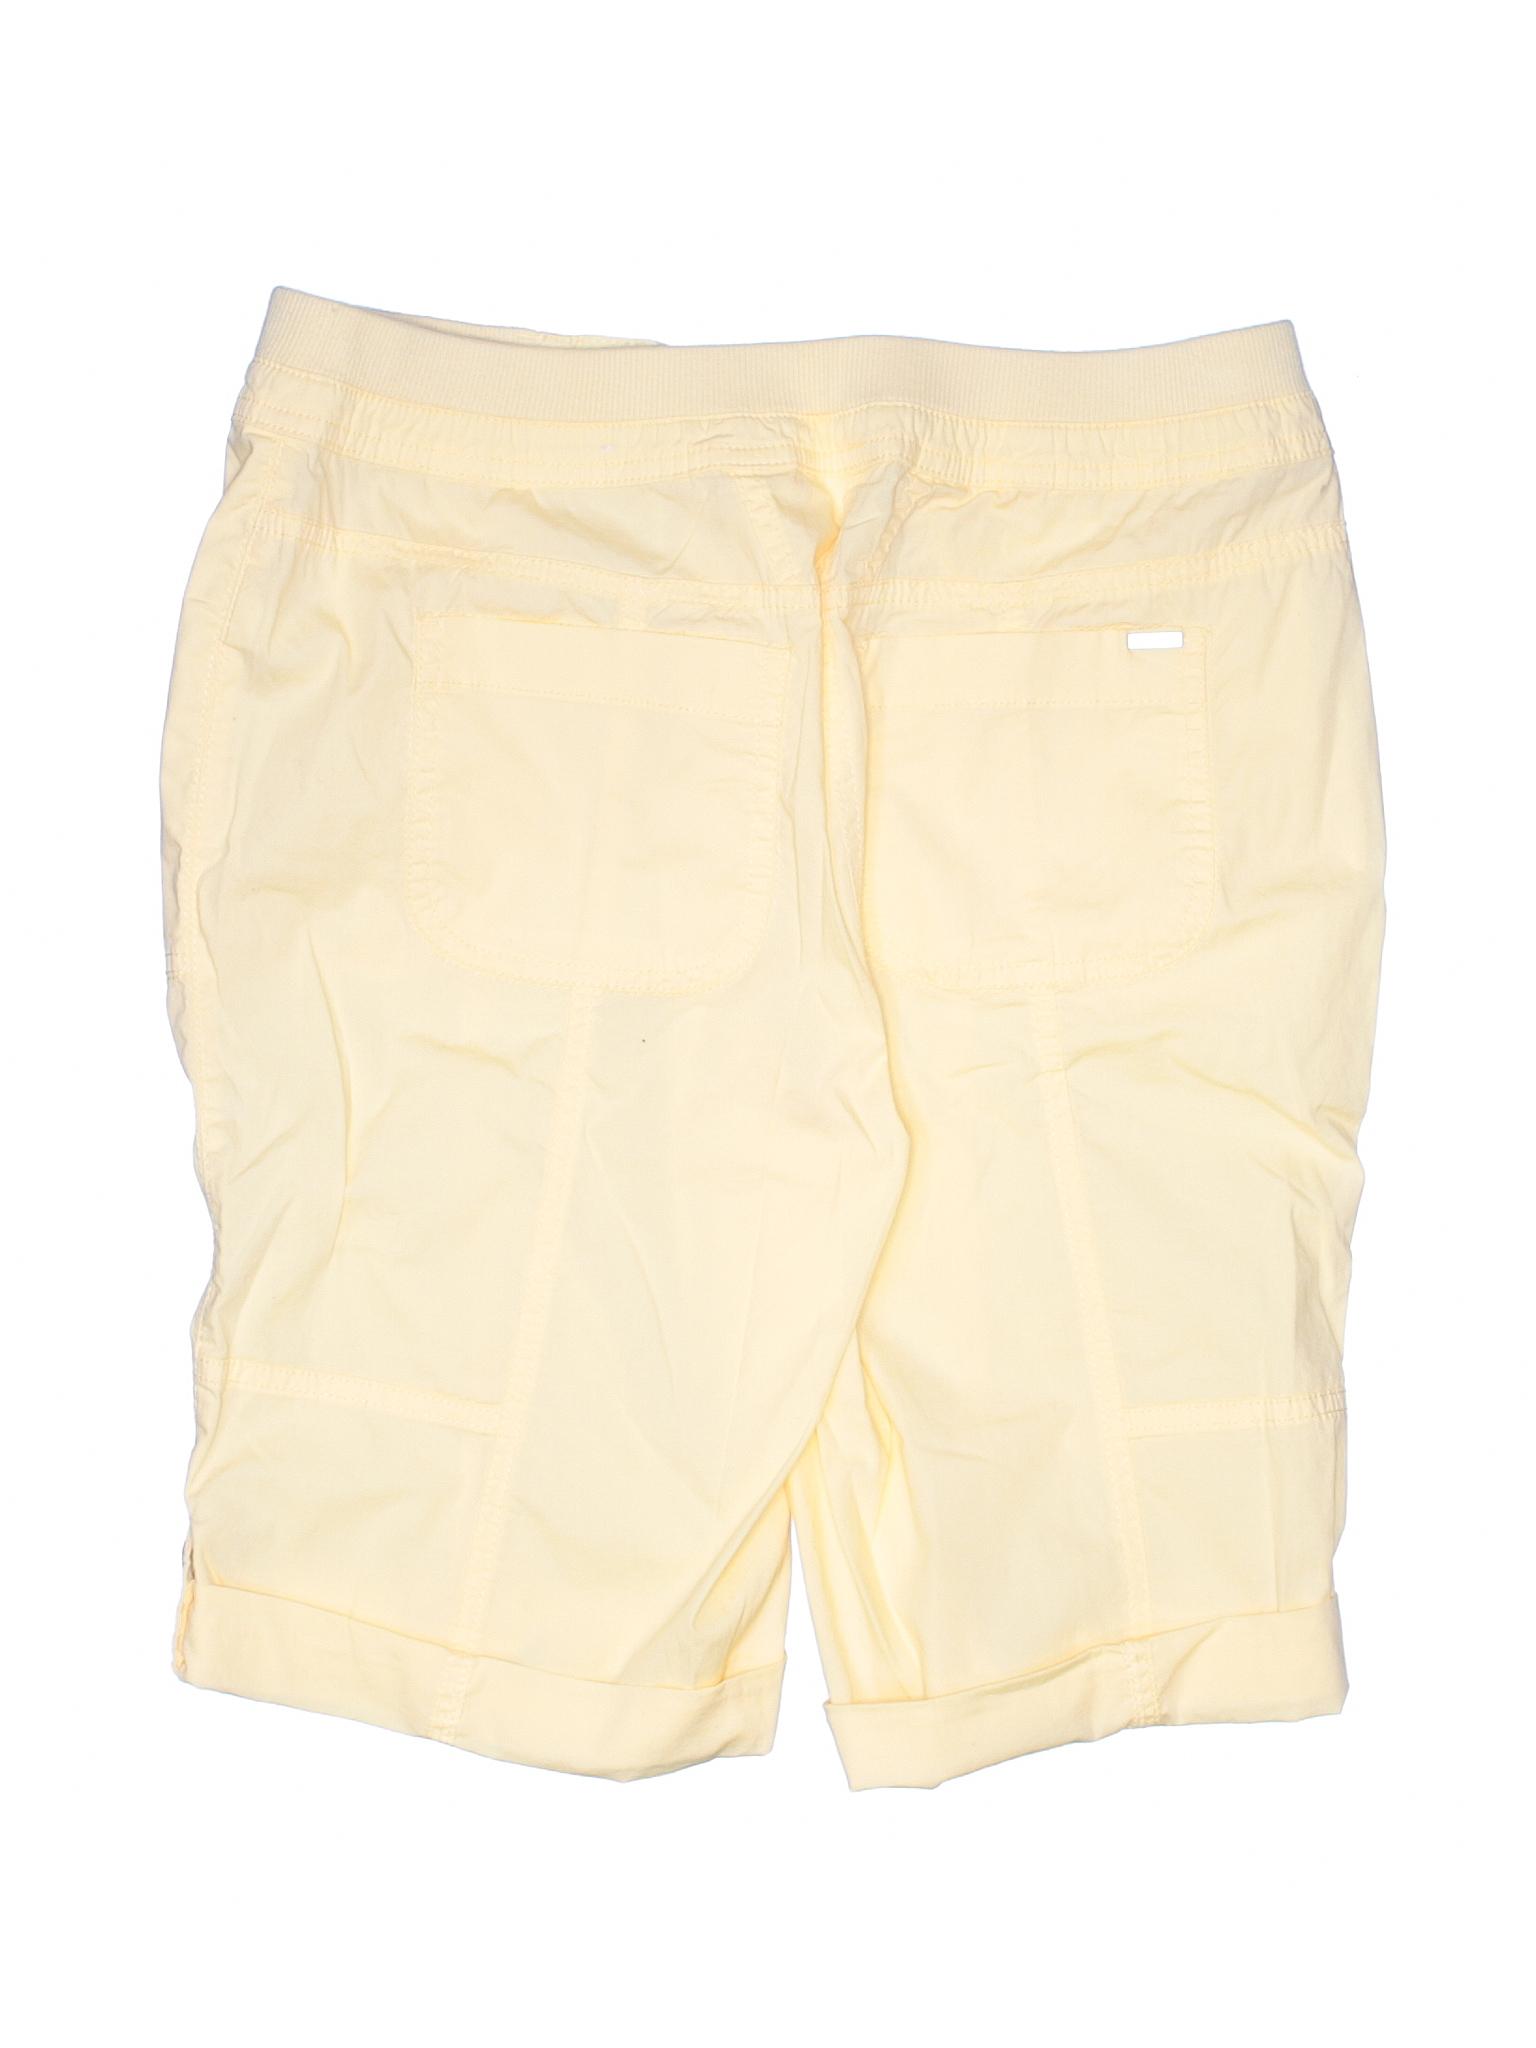 Boutique Boutique Shorts Chico's Shorts Shorts Chico's Boutique Chico's Boutique Boutique Shorts Chico's xqXYHFSF